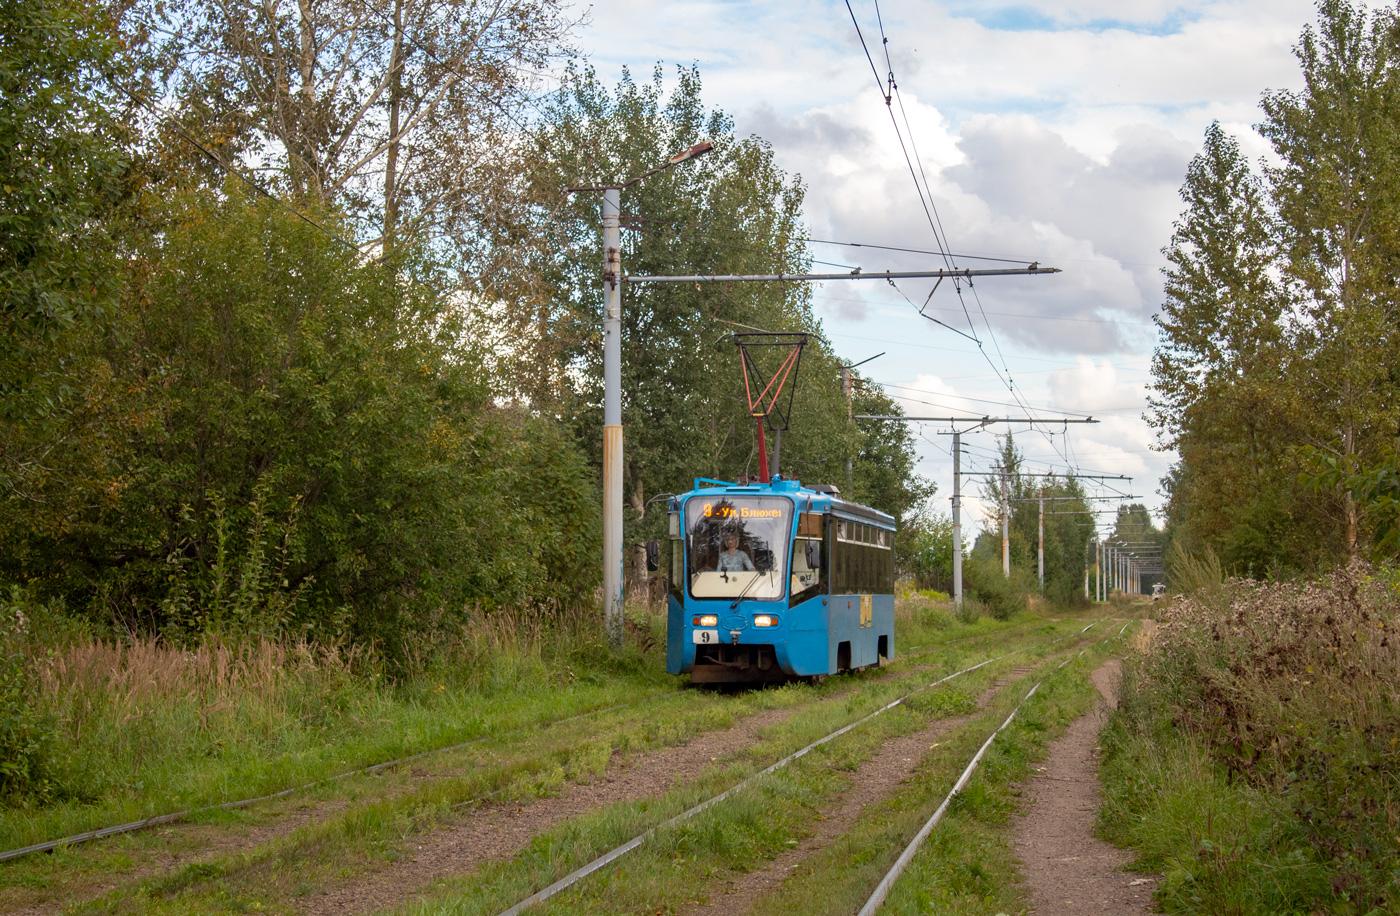 ярославские трамваи фото вагонов также верности